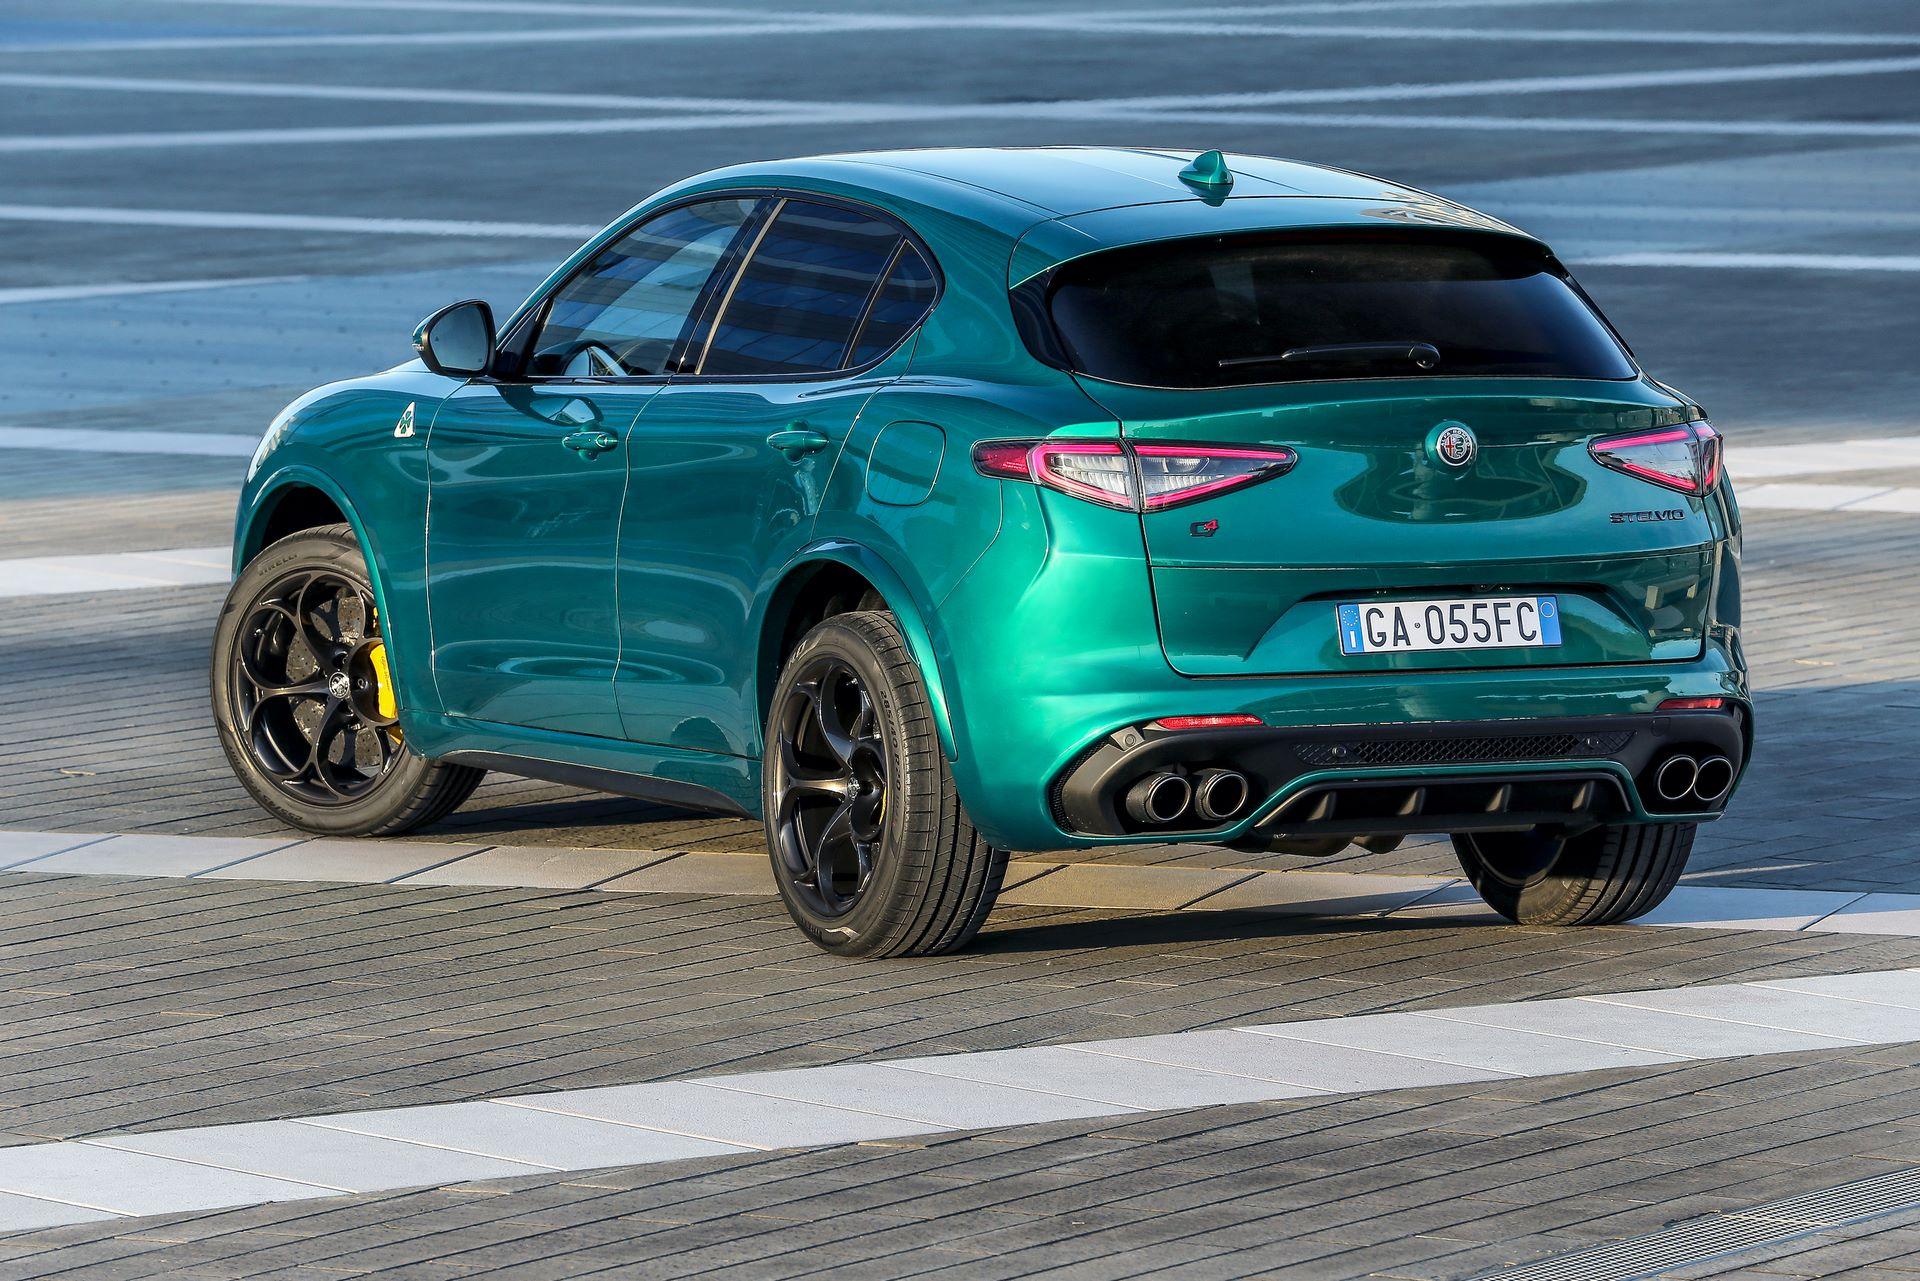 Alfa-Romeo-Giulia-Quadrifoglio-Stelvio-Quadrifoglio-facelift-2020-31